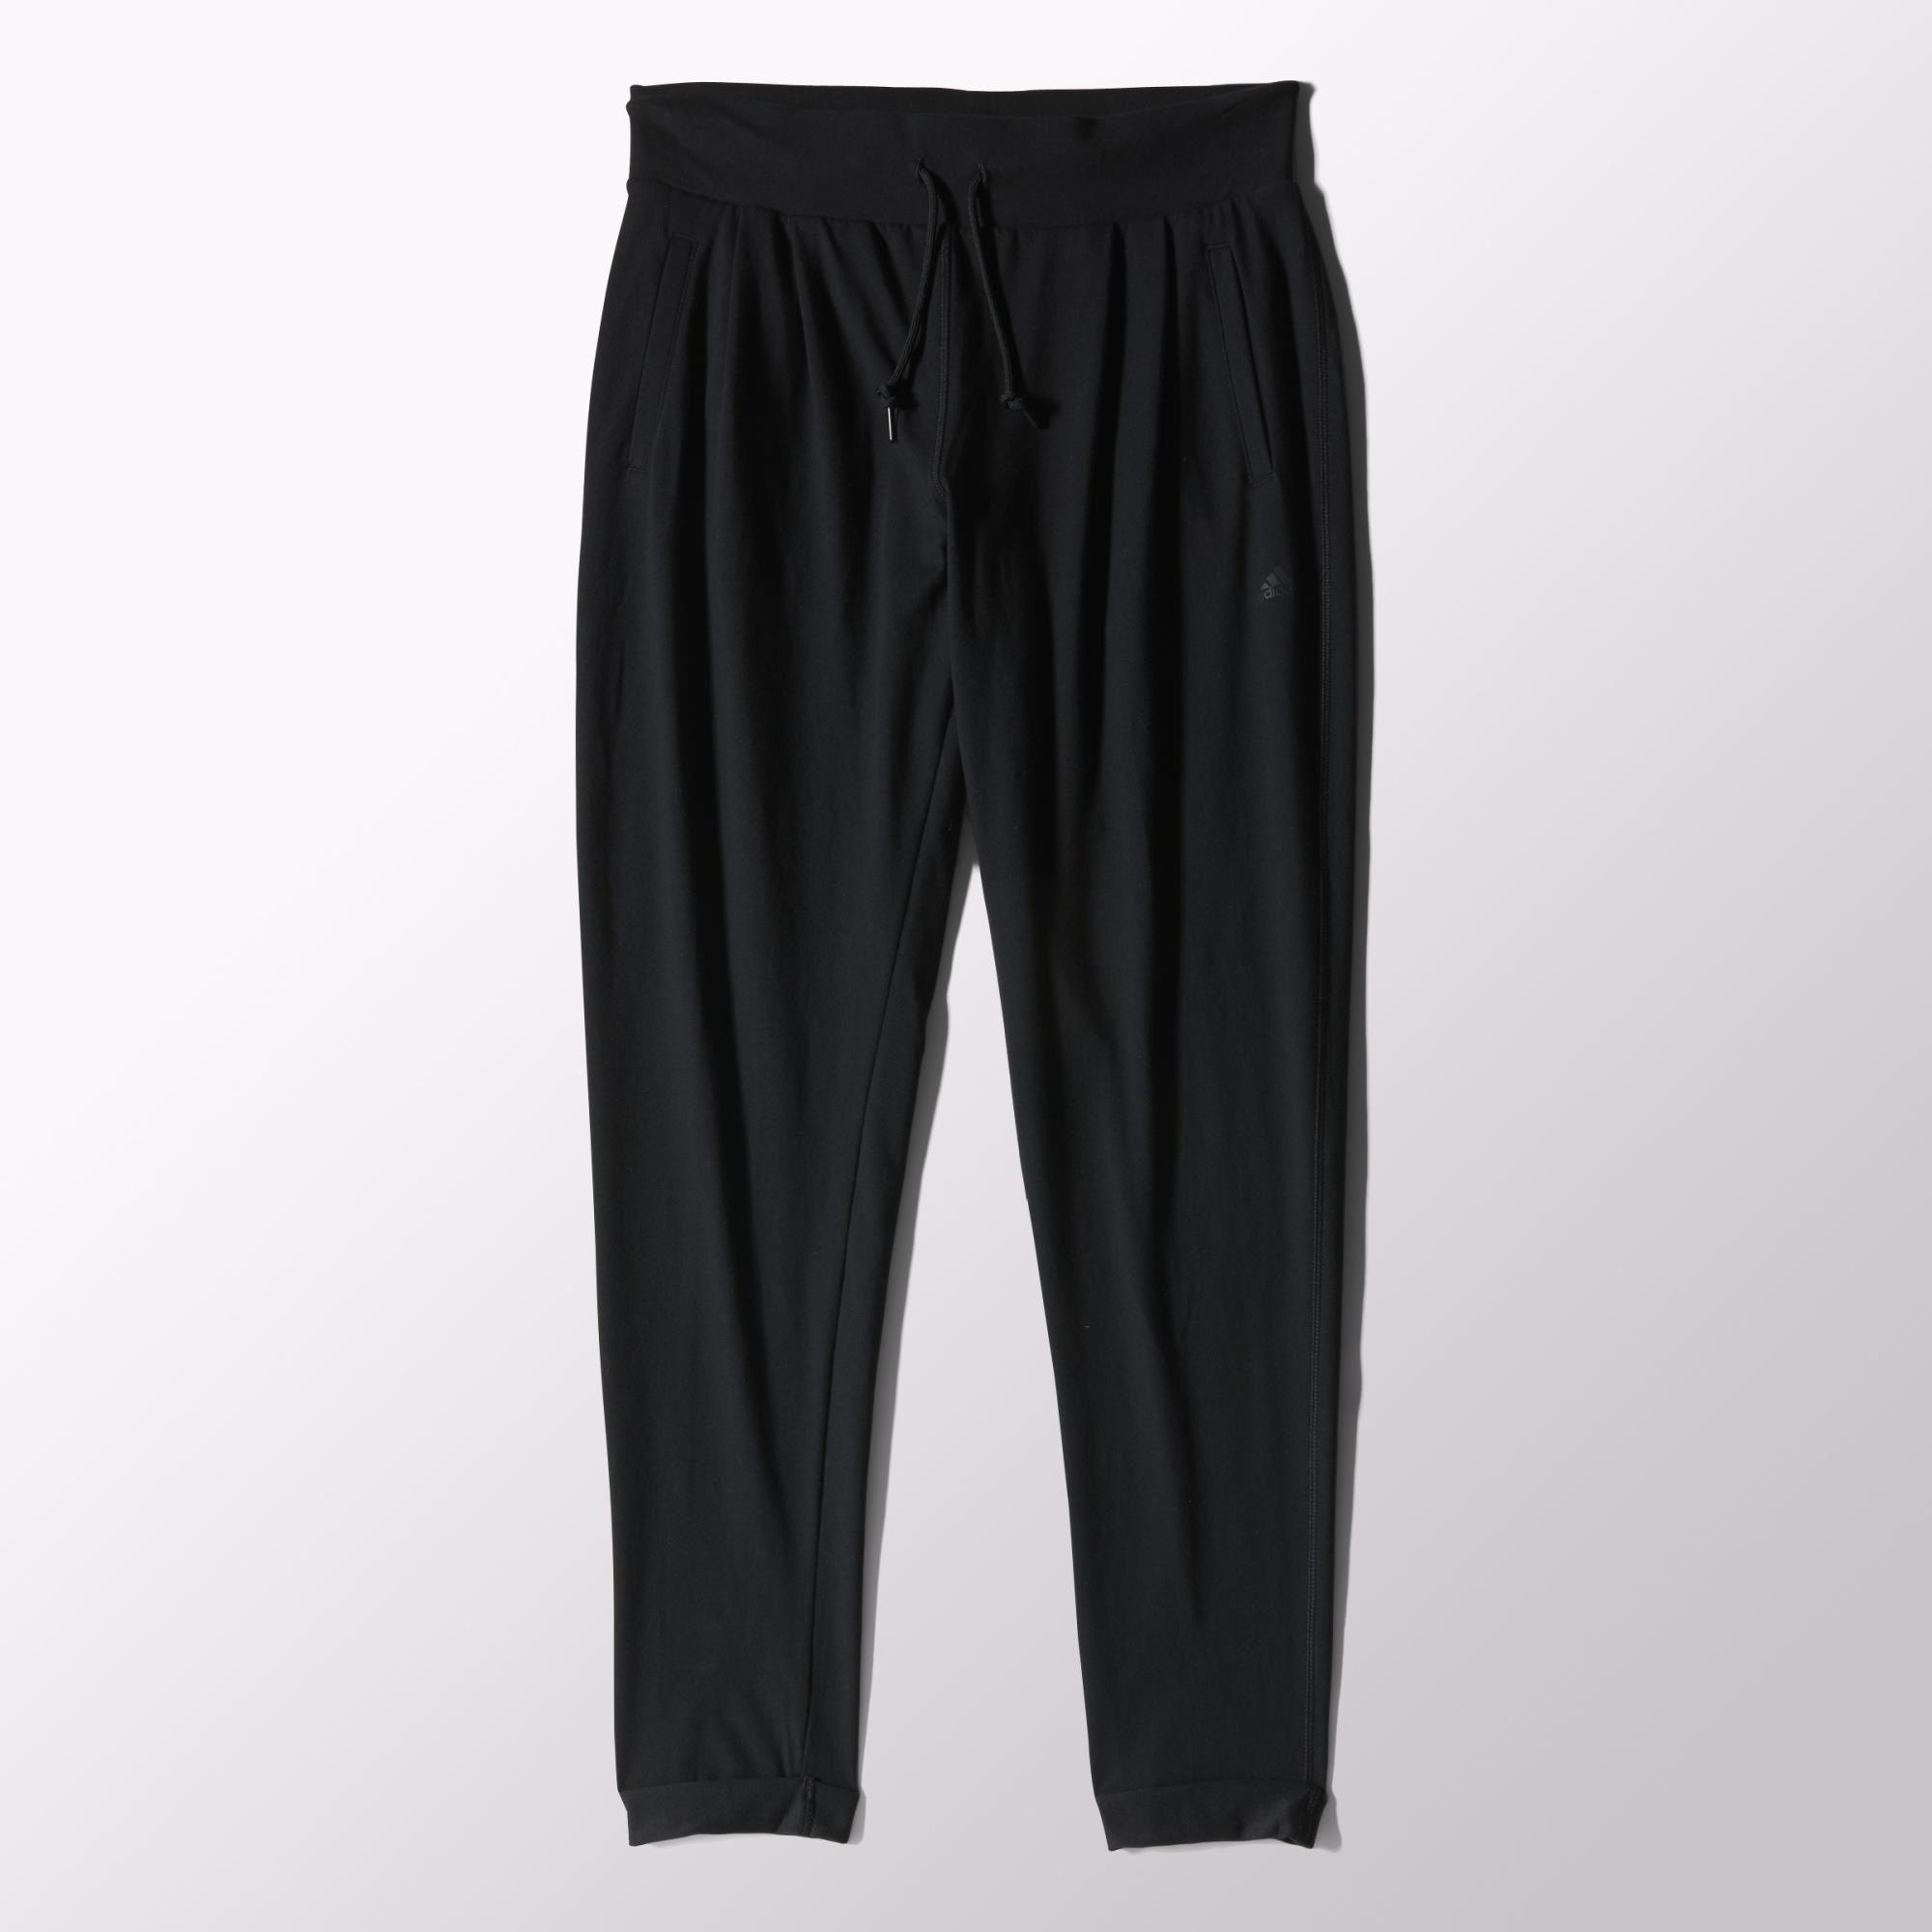 Sport Jersey Pantalón Mujer Adidas Essentials negro qwzHRg6x